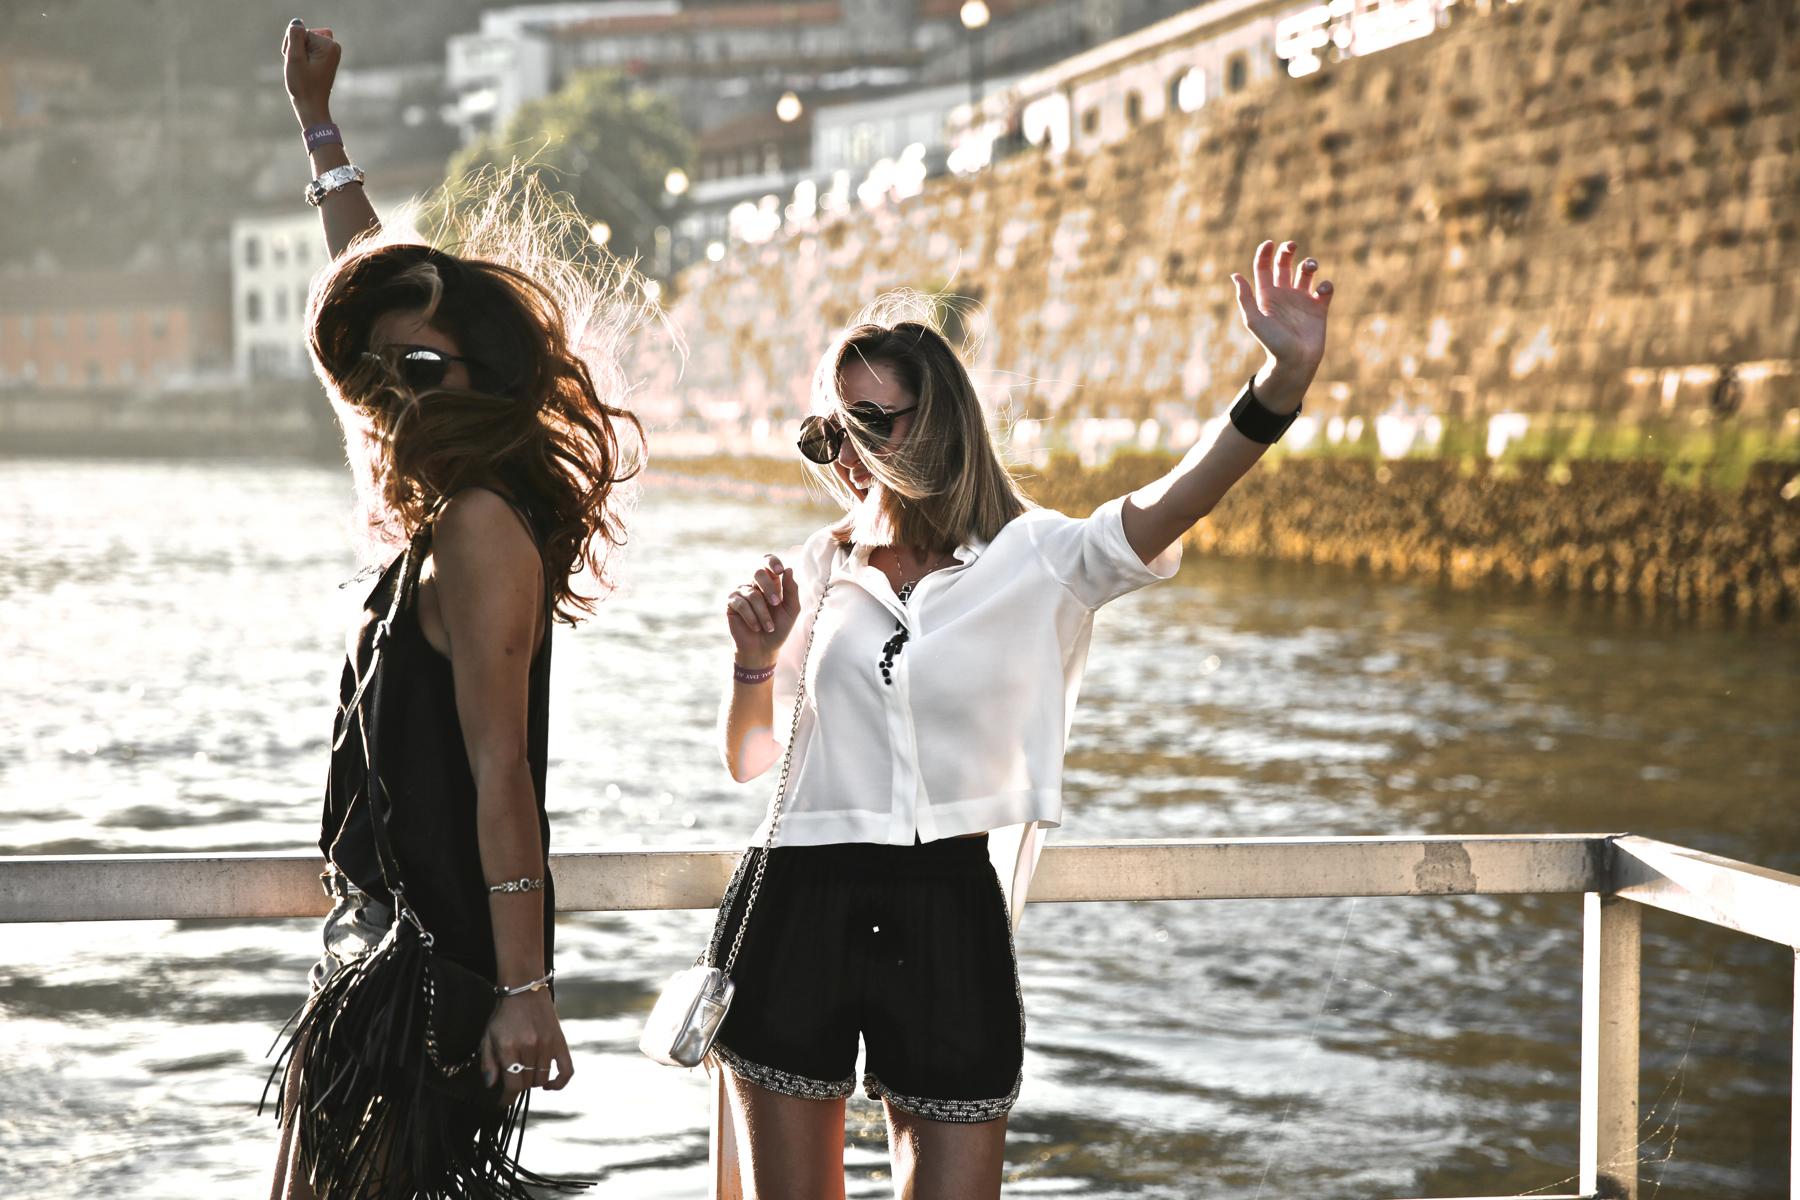 trendy_taste-look-outfit-street_style-ootd-blog-blogger-fashion_spain-moda_españa-salsa_jeans-dior_gafas-bolso_flecos-fringes_bag-khaki_shorts-shorts_caqui-grey_tee-camiseta_gris-verano-porto-portugal-16